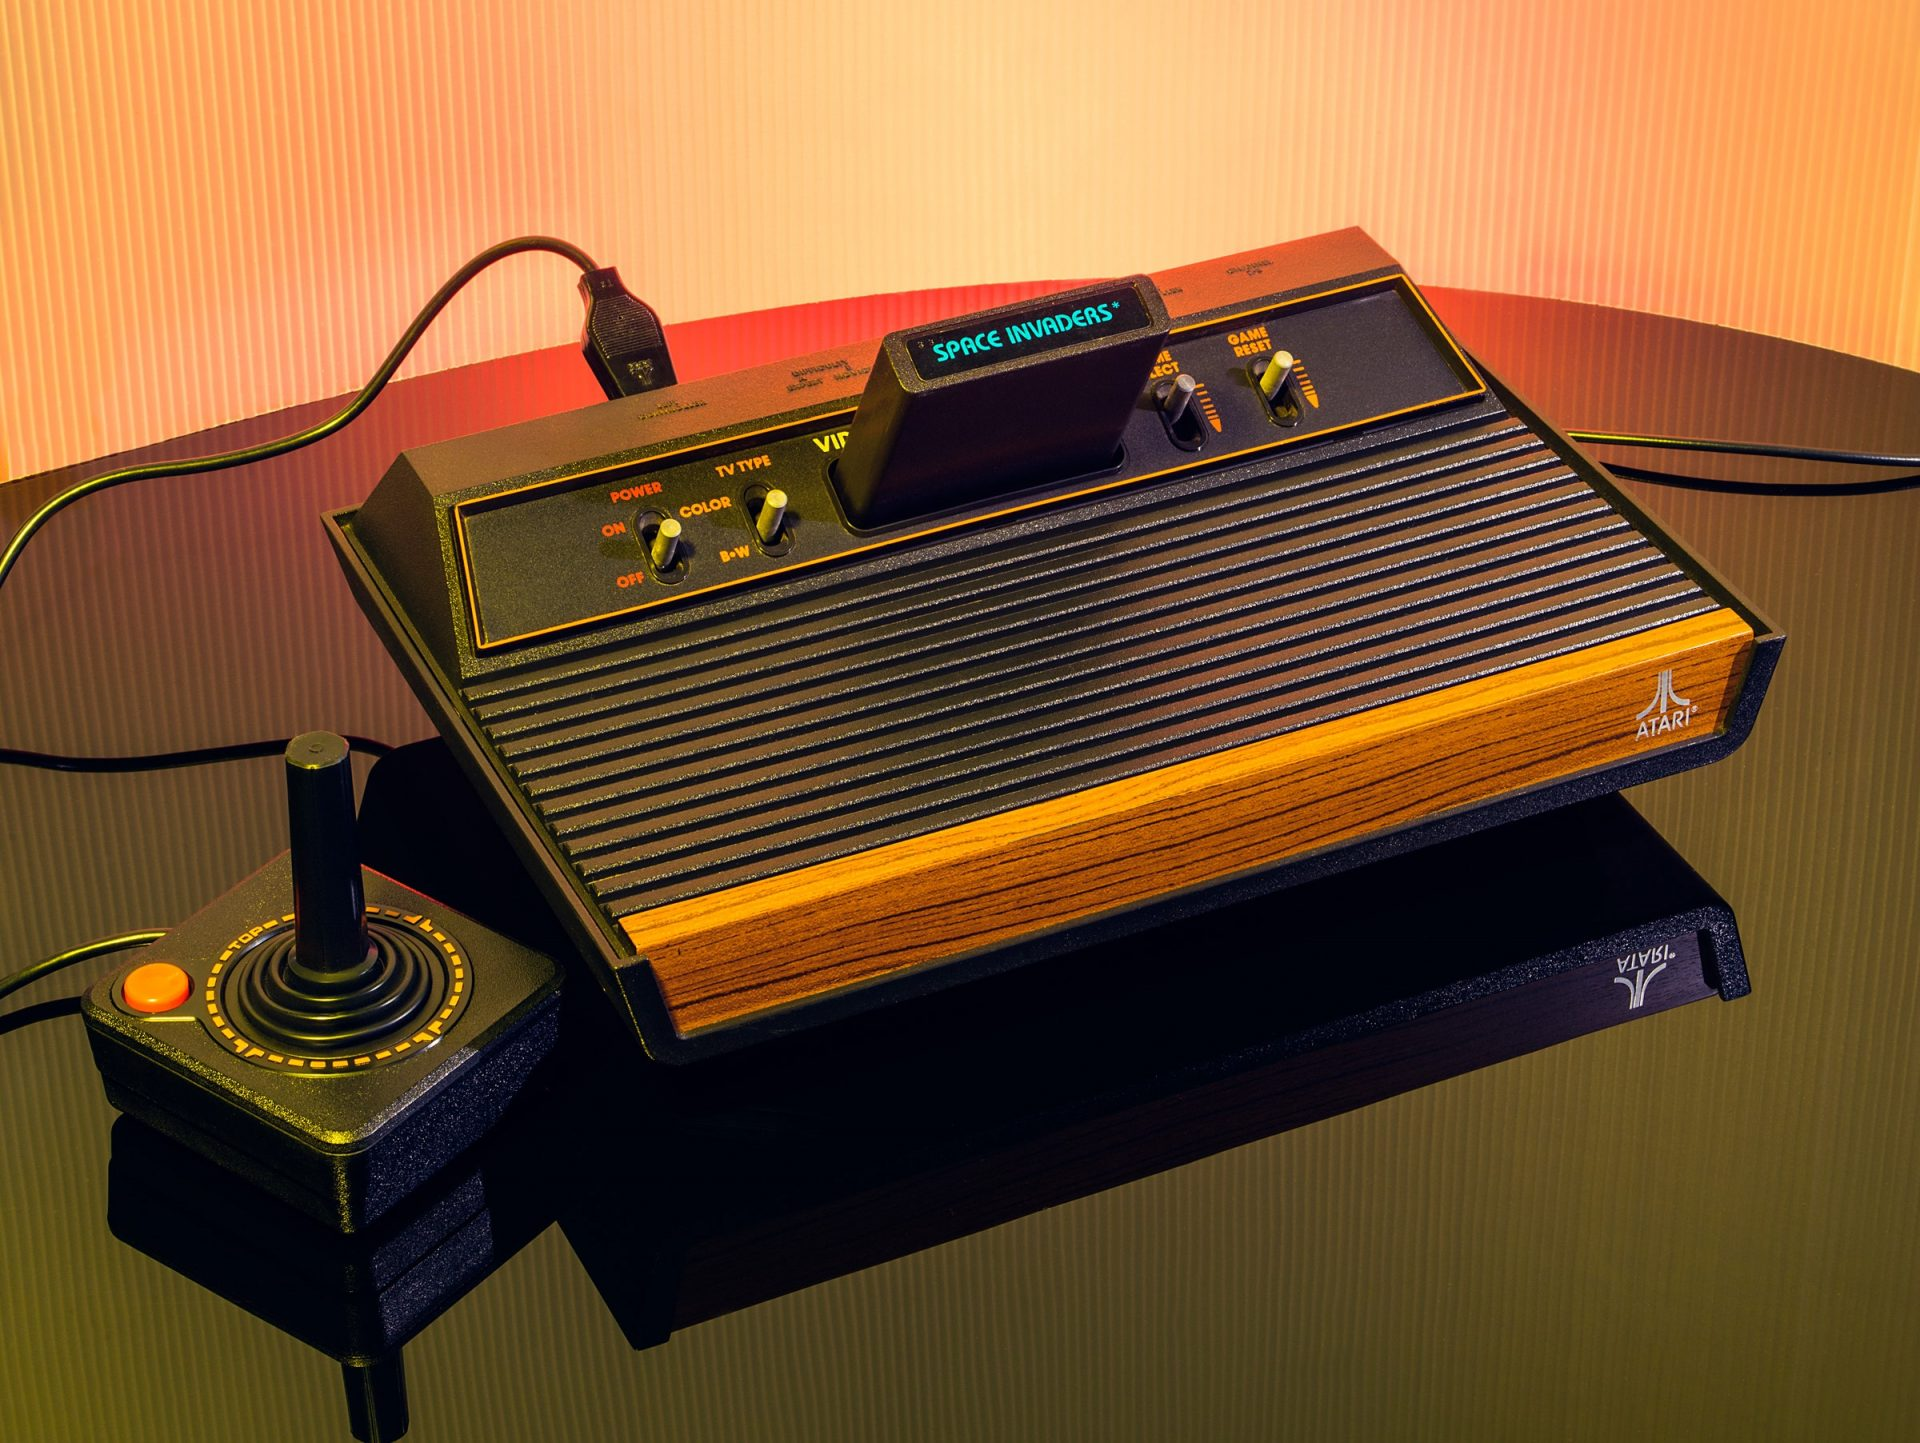 videogame atari 2600